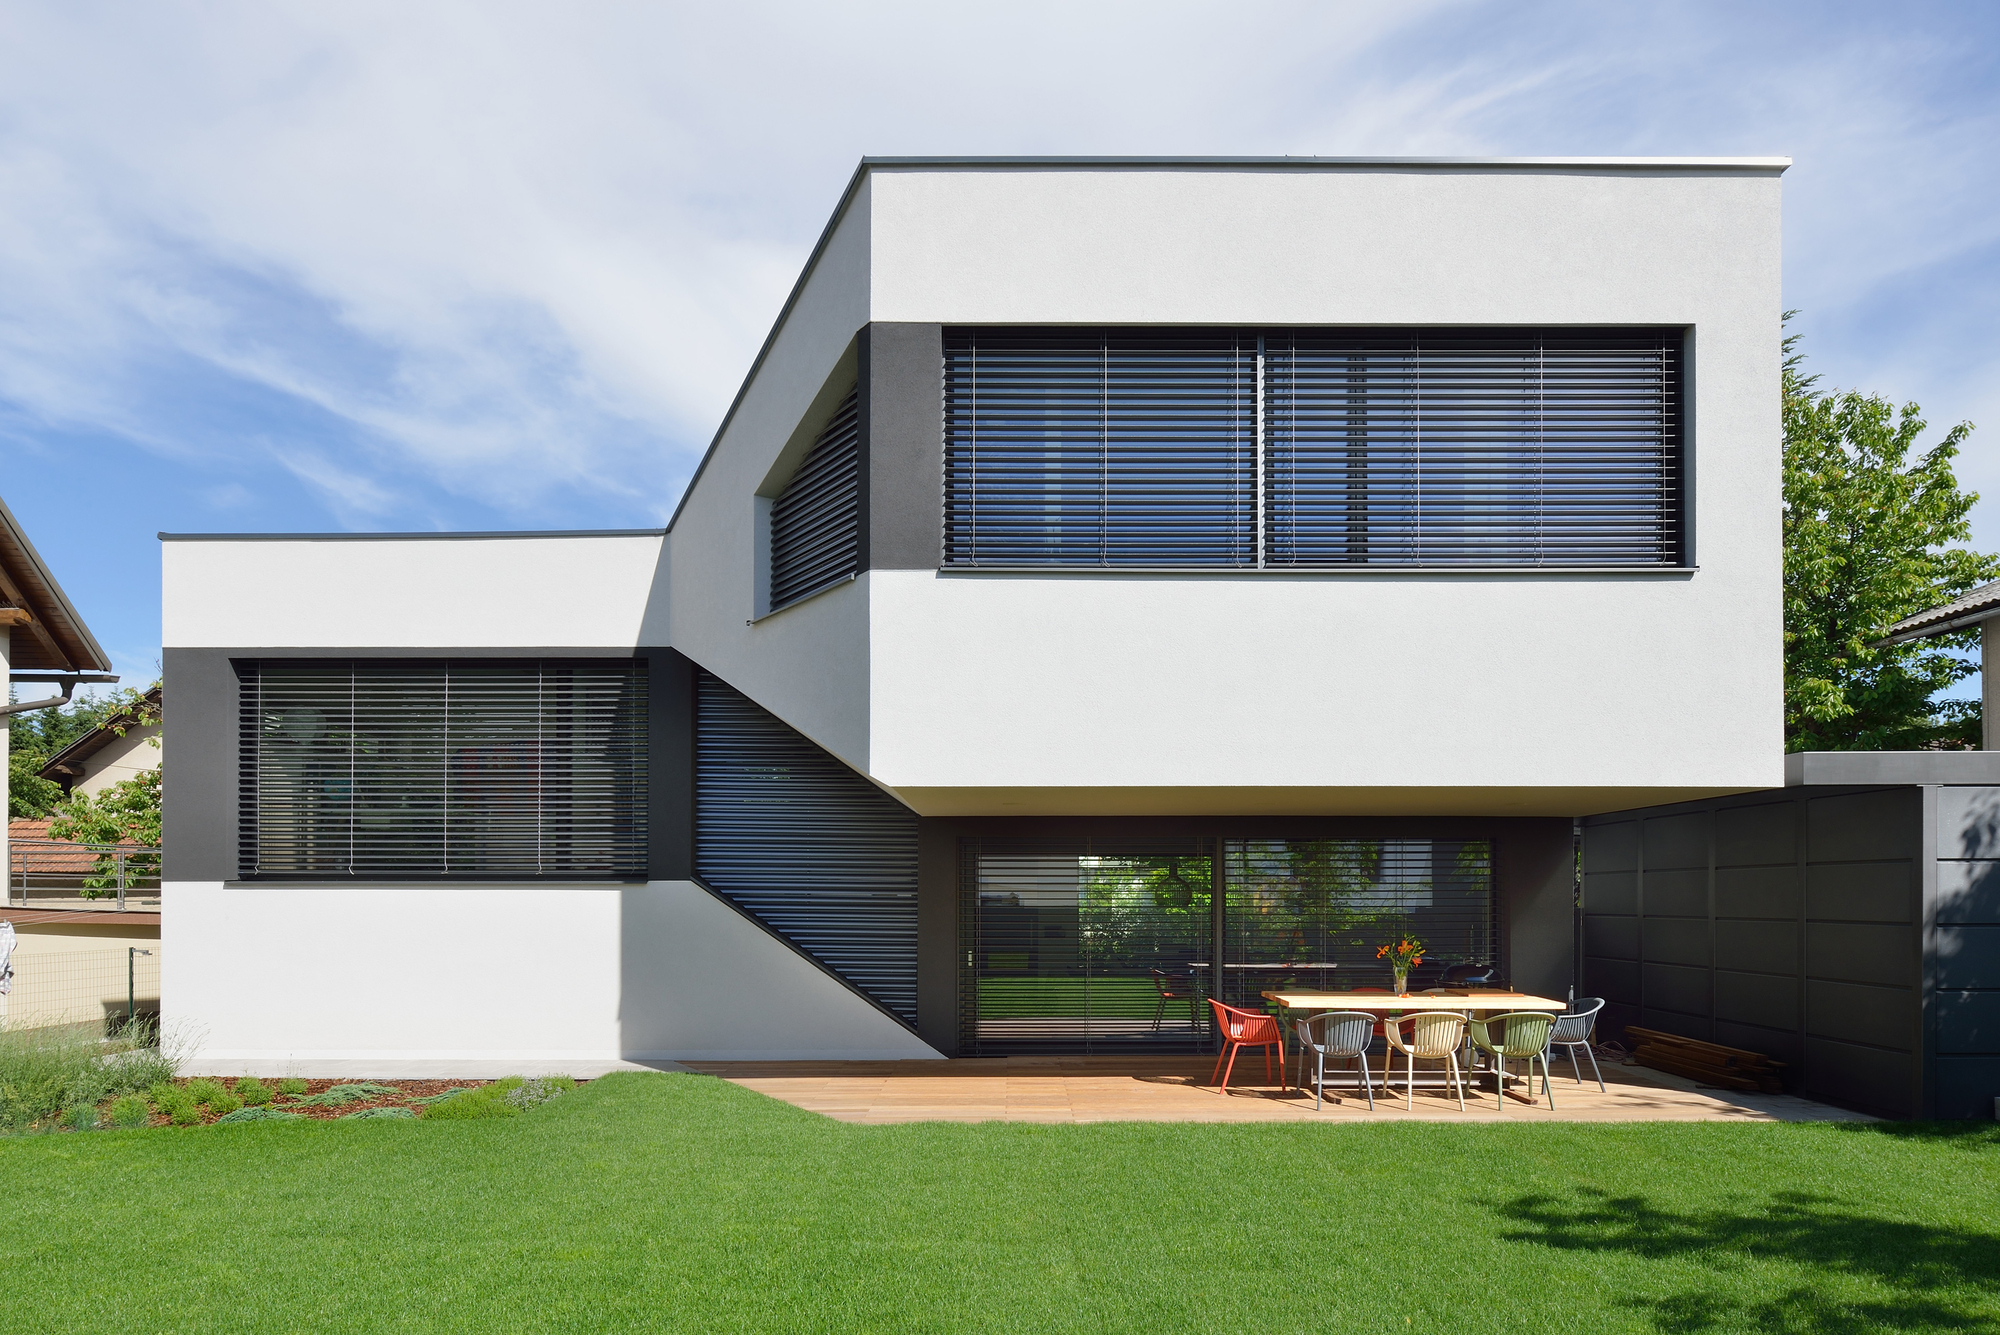 Gallery of mezzanine house elastik architecture for Mezzanine architecture